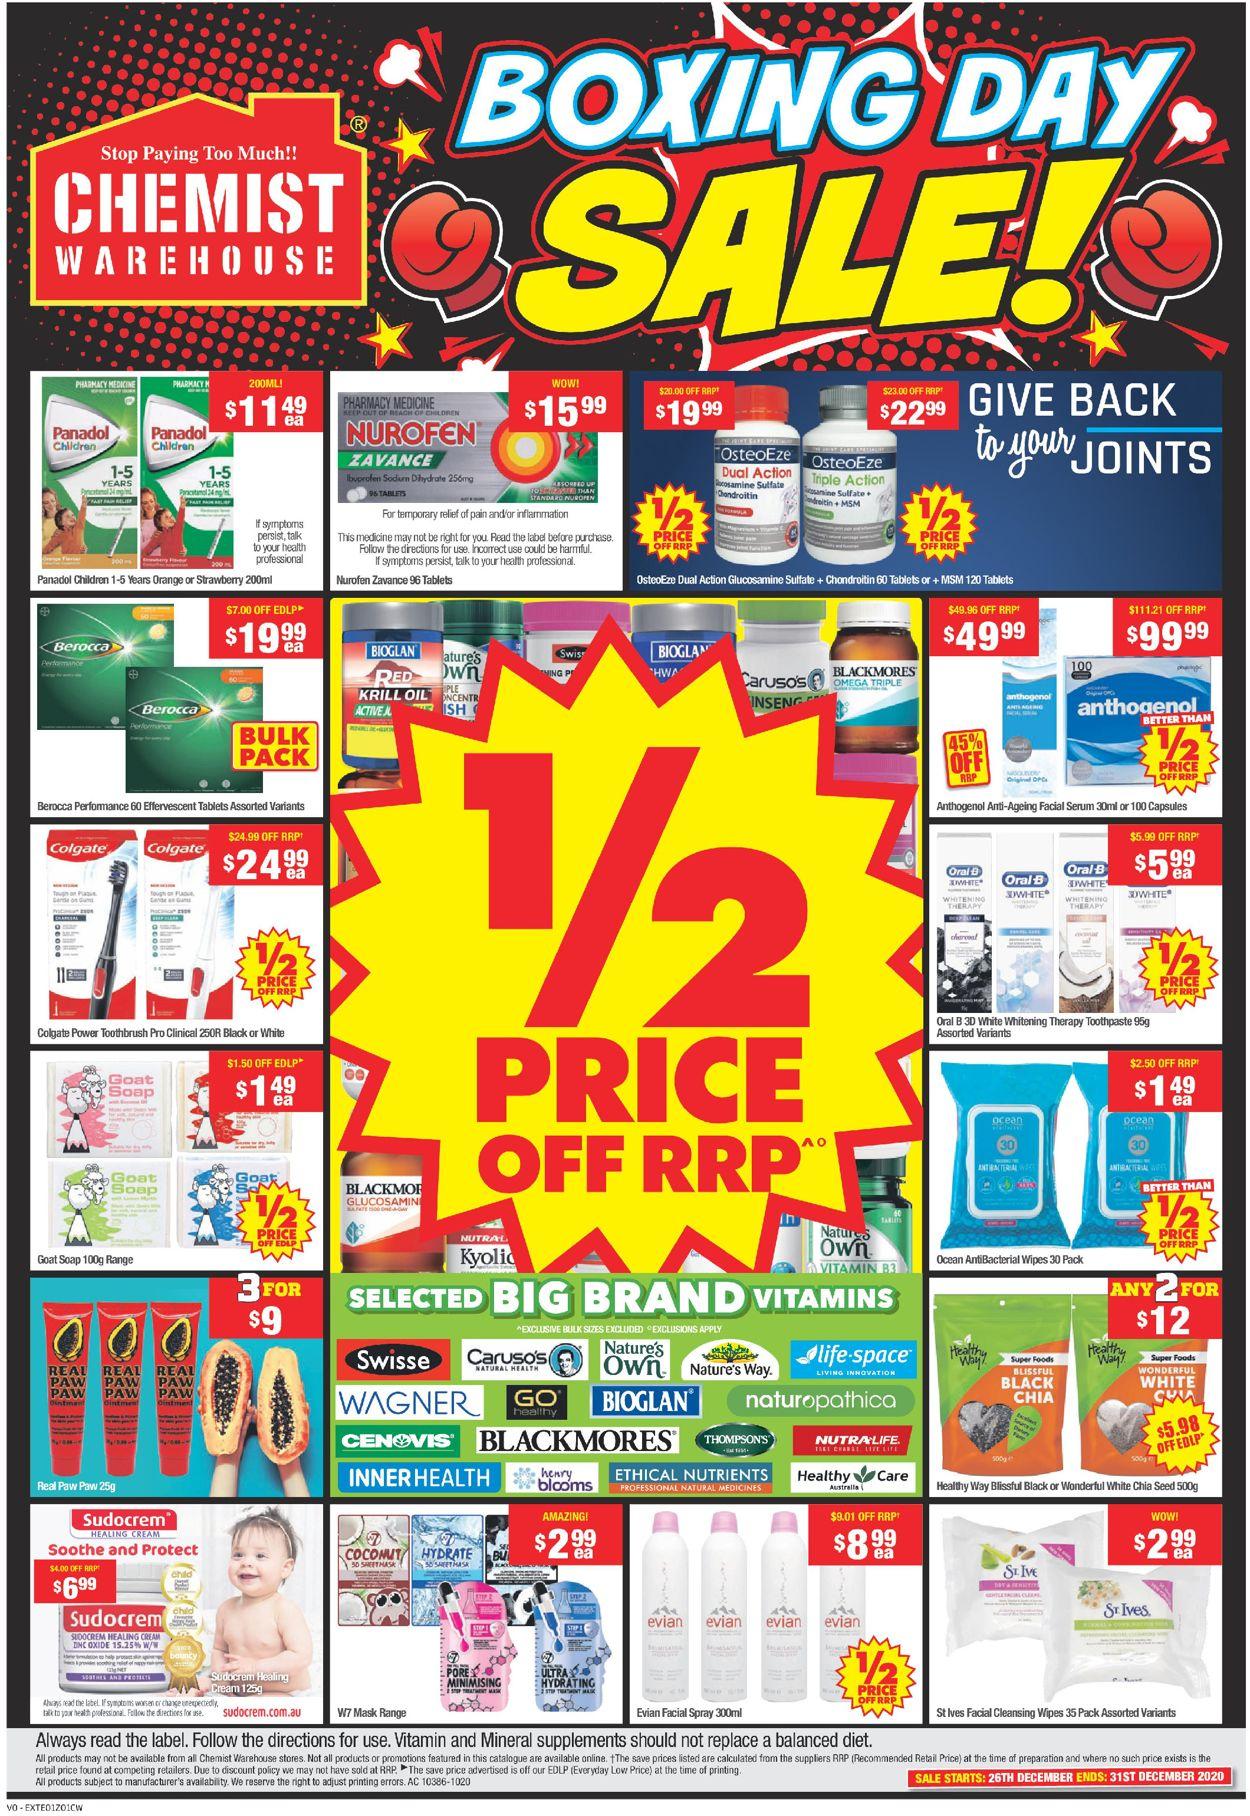 Chemist Warehouse - Boxing Day 2020 Catalogue - 26/12-31/12/2020